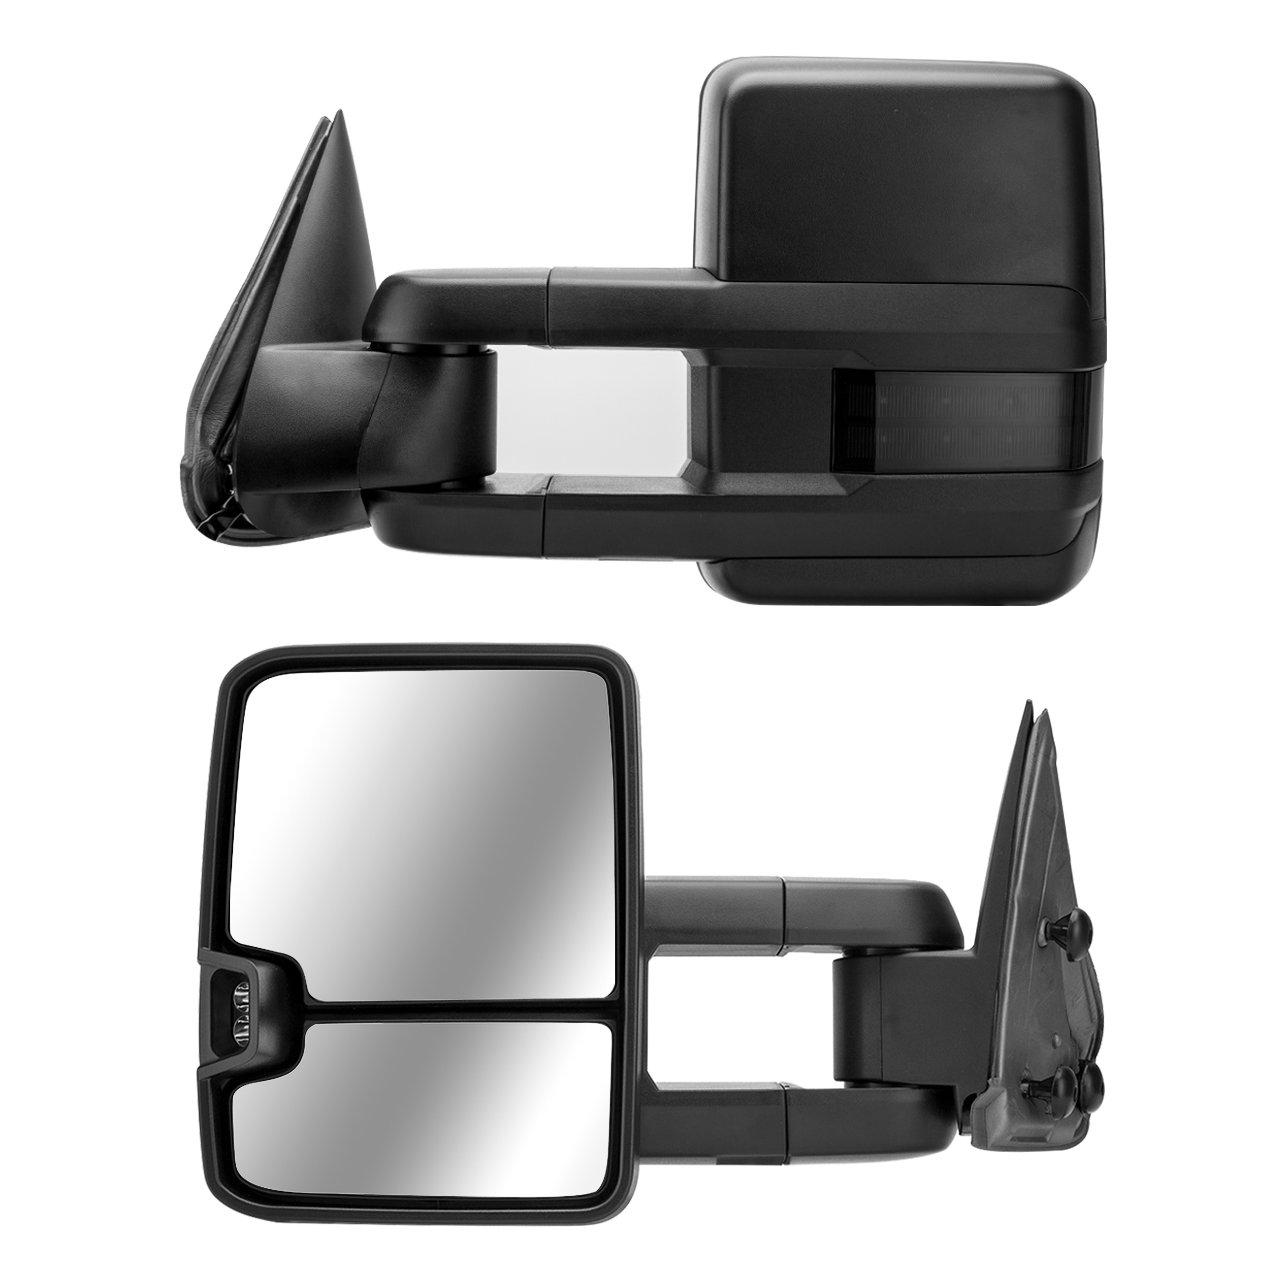 Dedc Tow Mirrors Fit For Chevy Silverado 1500 2500 3500 Reverse Light Wire Diagram 99 Gmc Sierra 2003 2004 2005 2006 A Pair Automotive